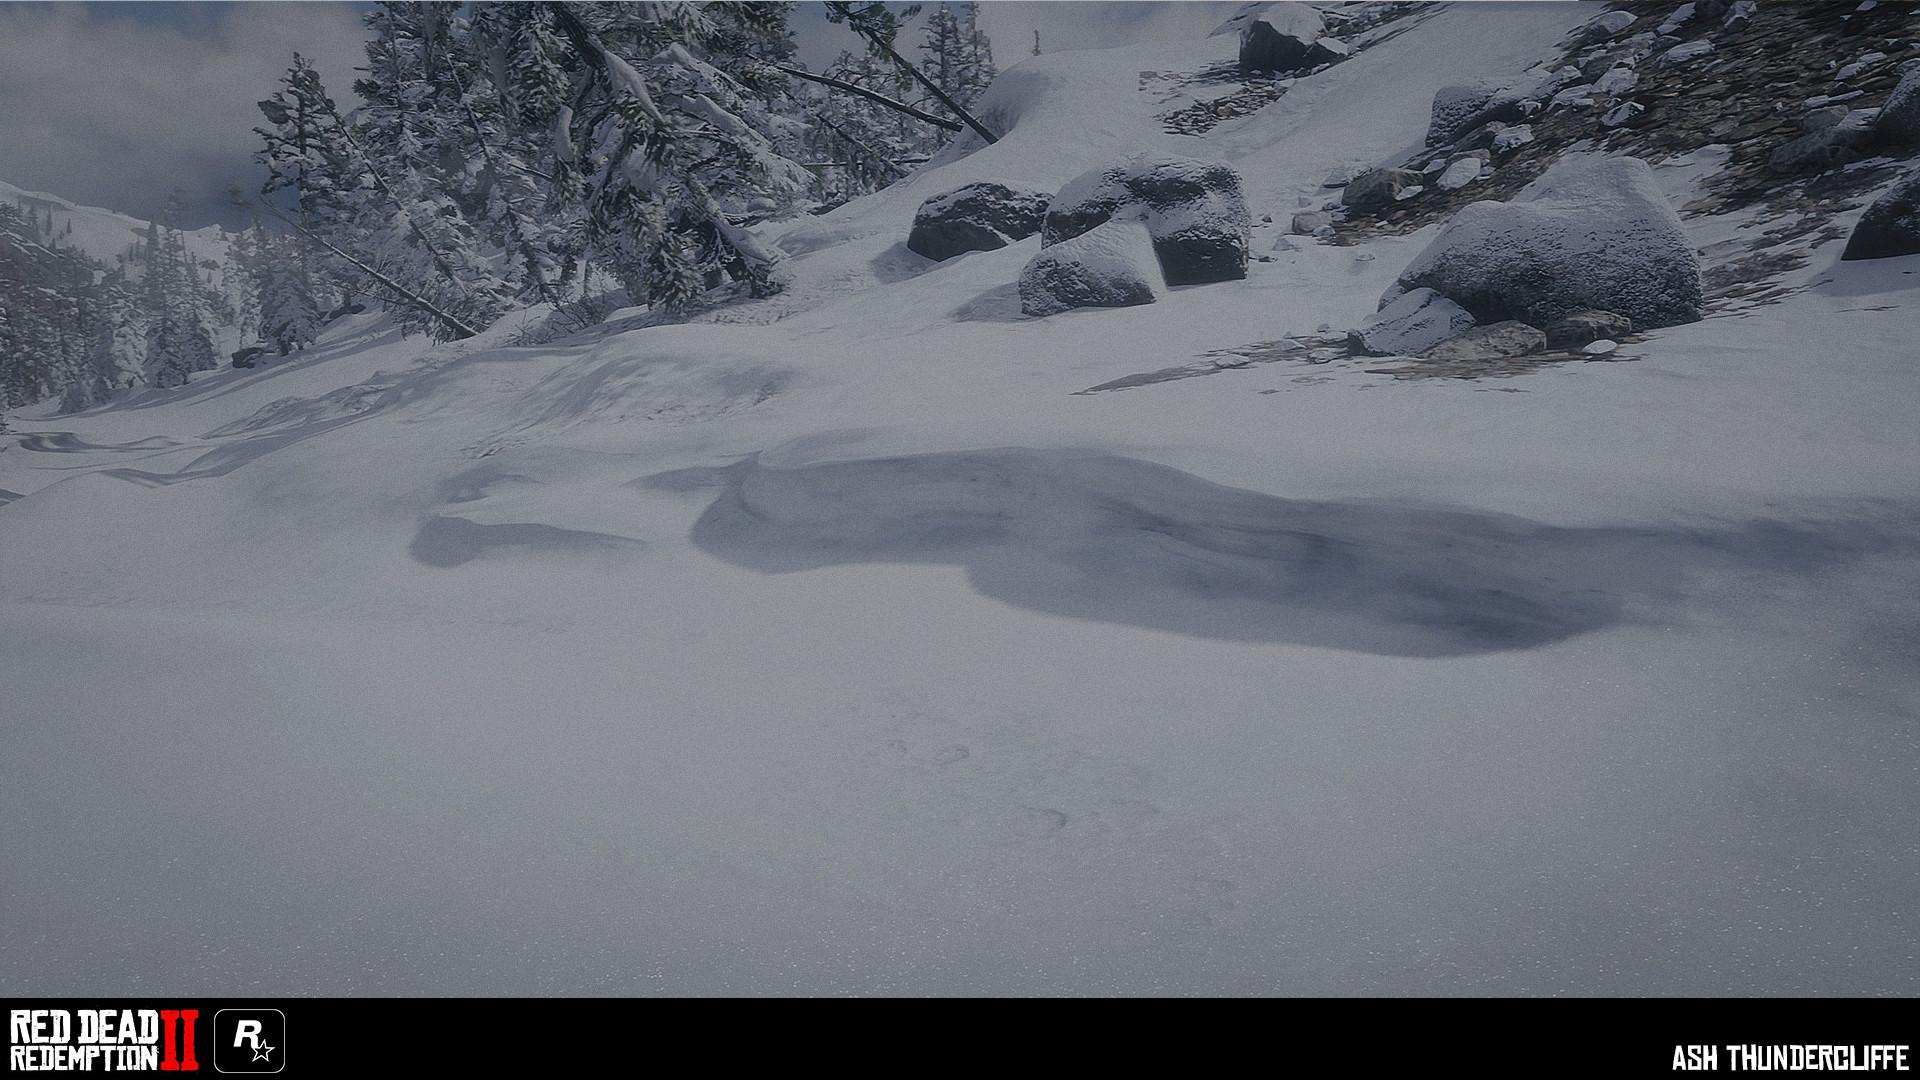 Ash thundercliffe snow 1